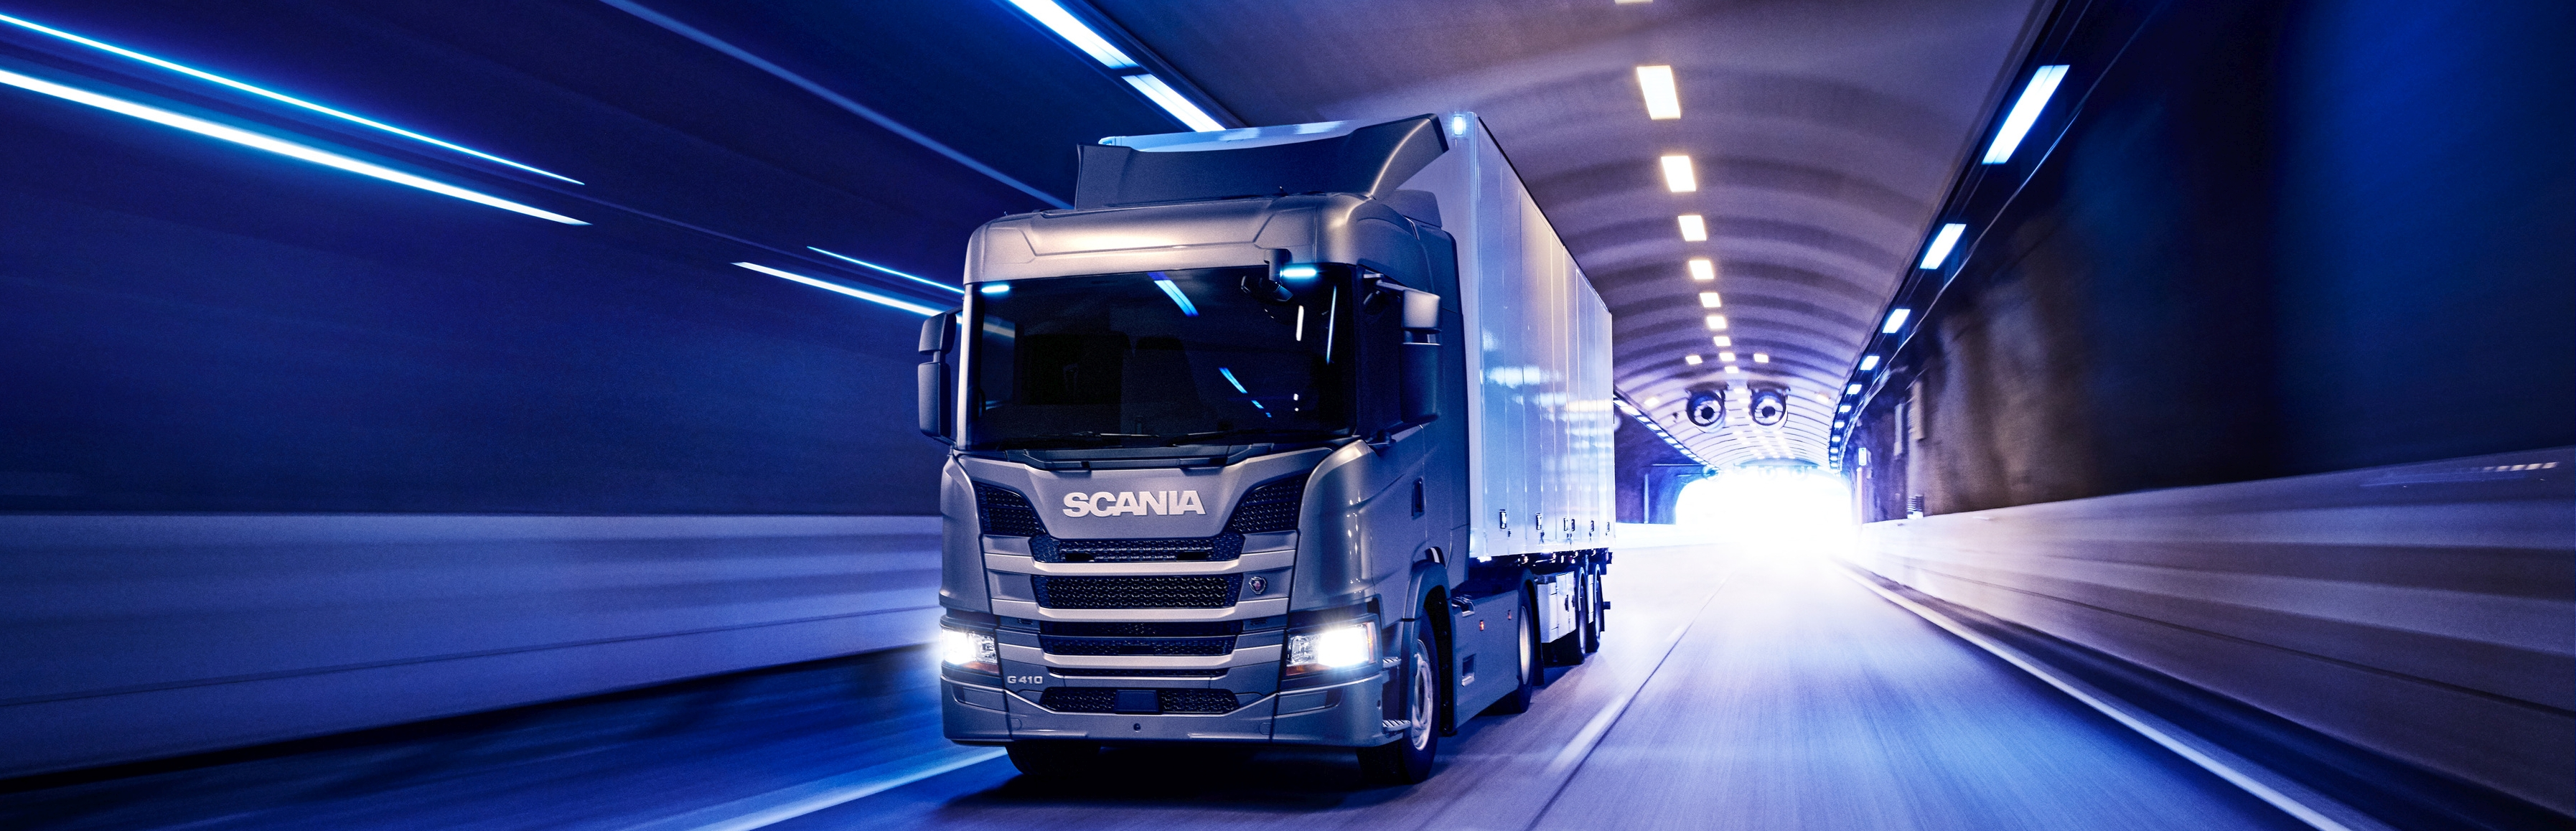 Scania G 410 4x2, general cargo transport